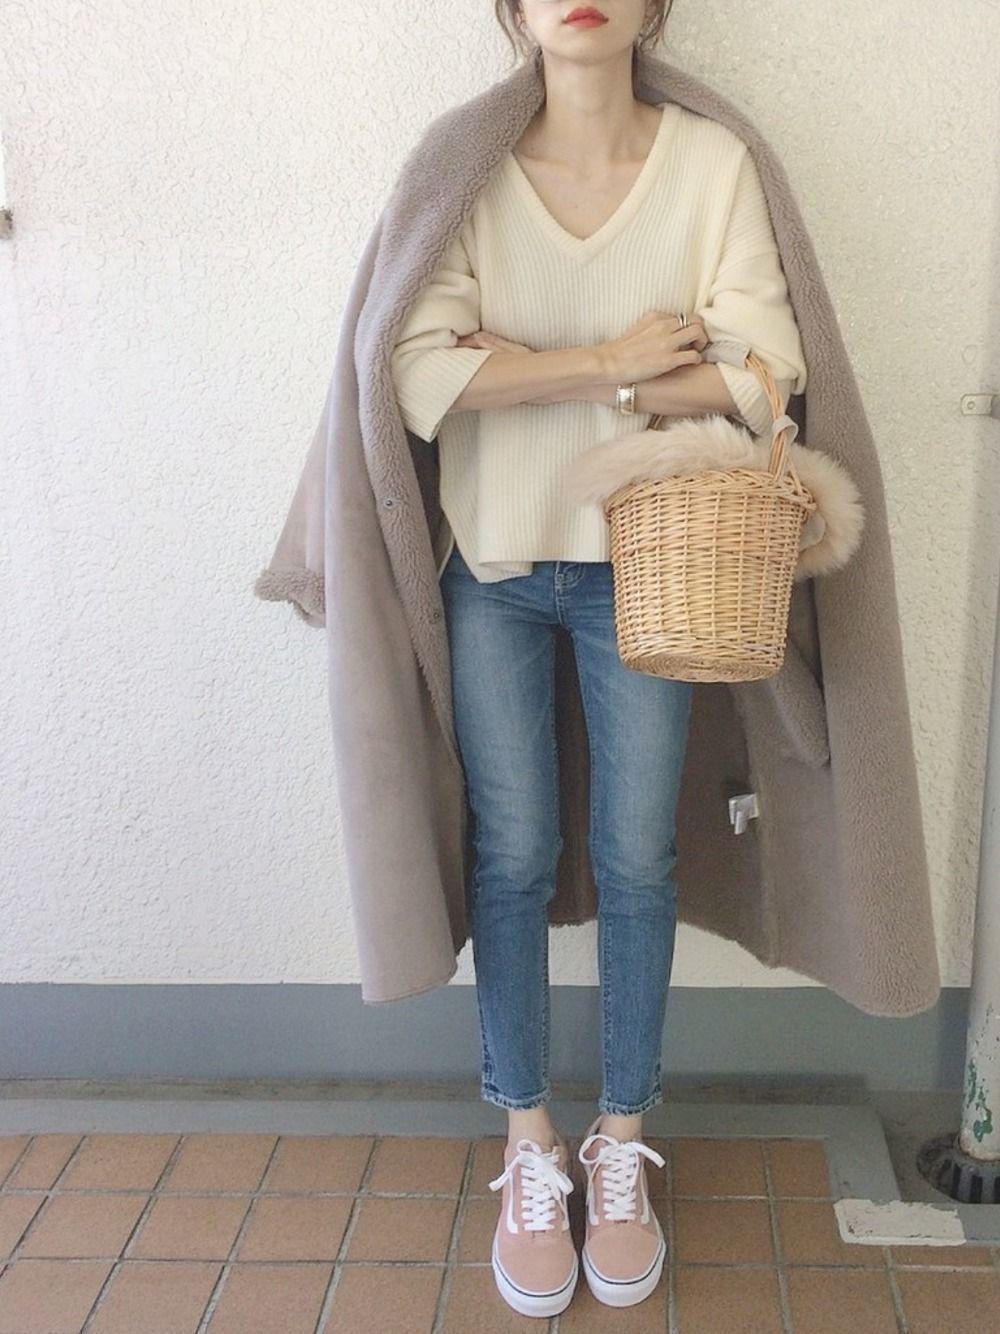 【Vネック】が流行中!モテファッションの鍵はこれだった♡の2枚目の画像